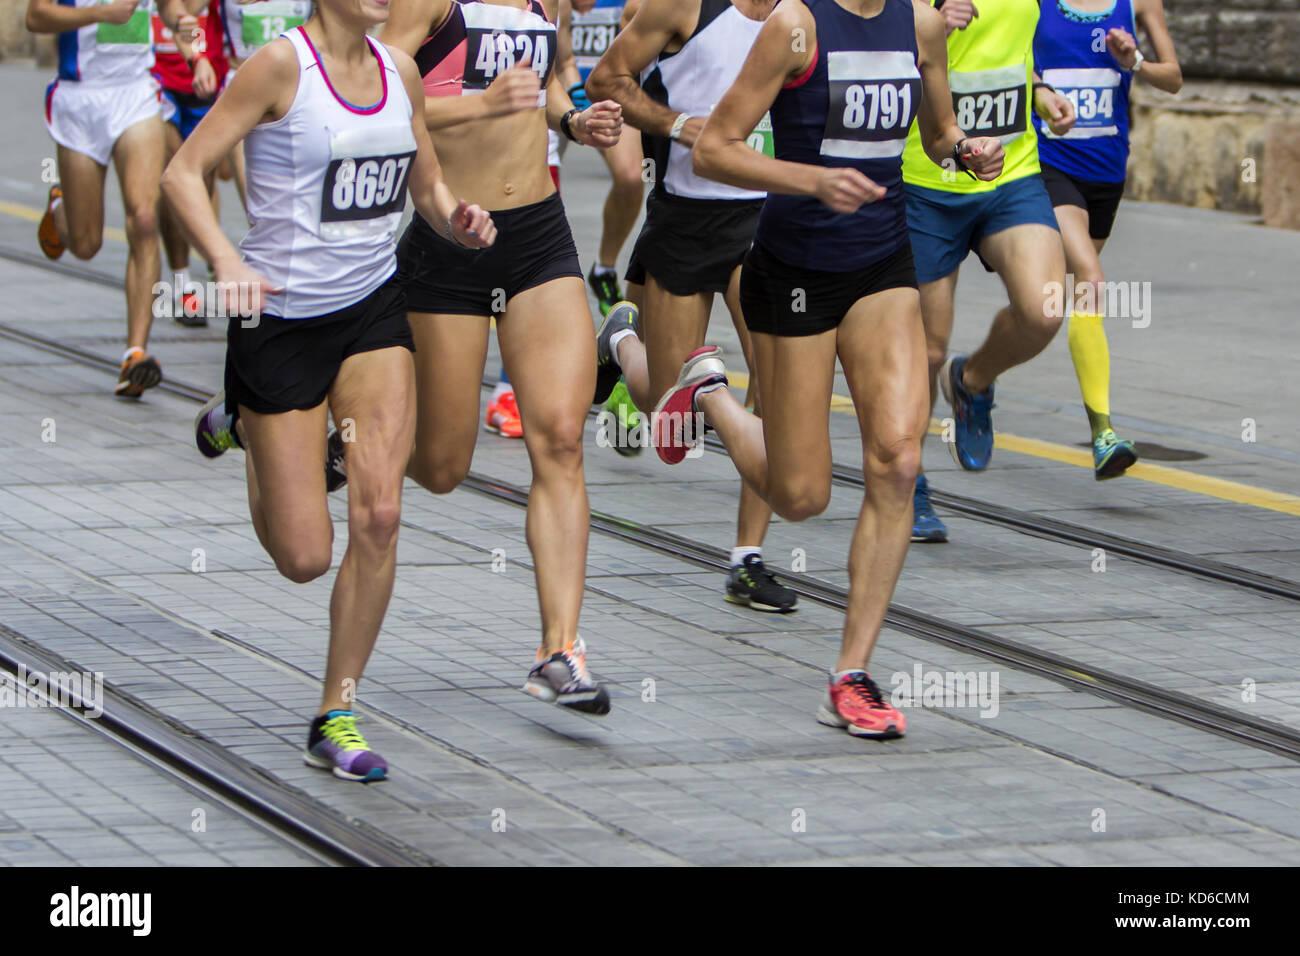 Marathon running race on the city road - Stock Image